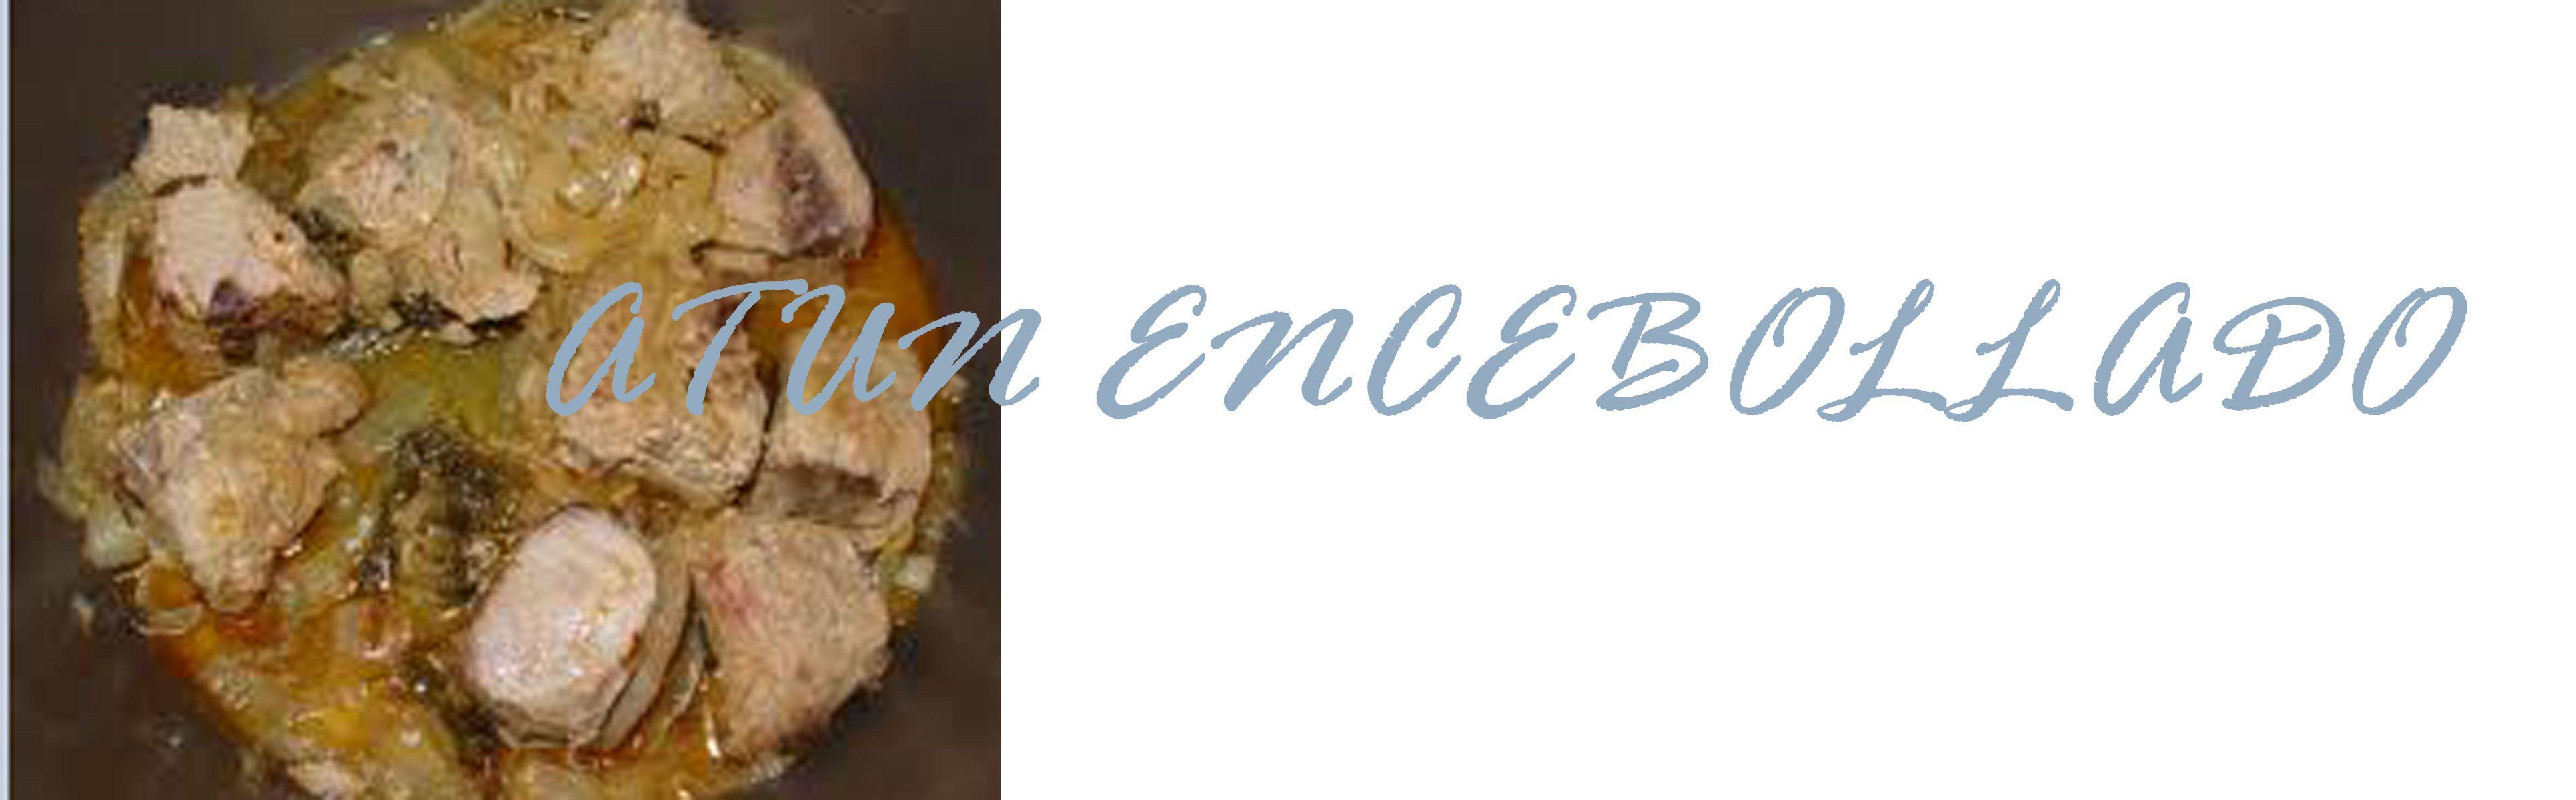 Recetas típicas de Zahara de los Atunes. http://restaurantes-zahara.com/recetasdezaharadelosatunes.html